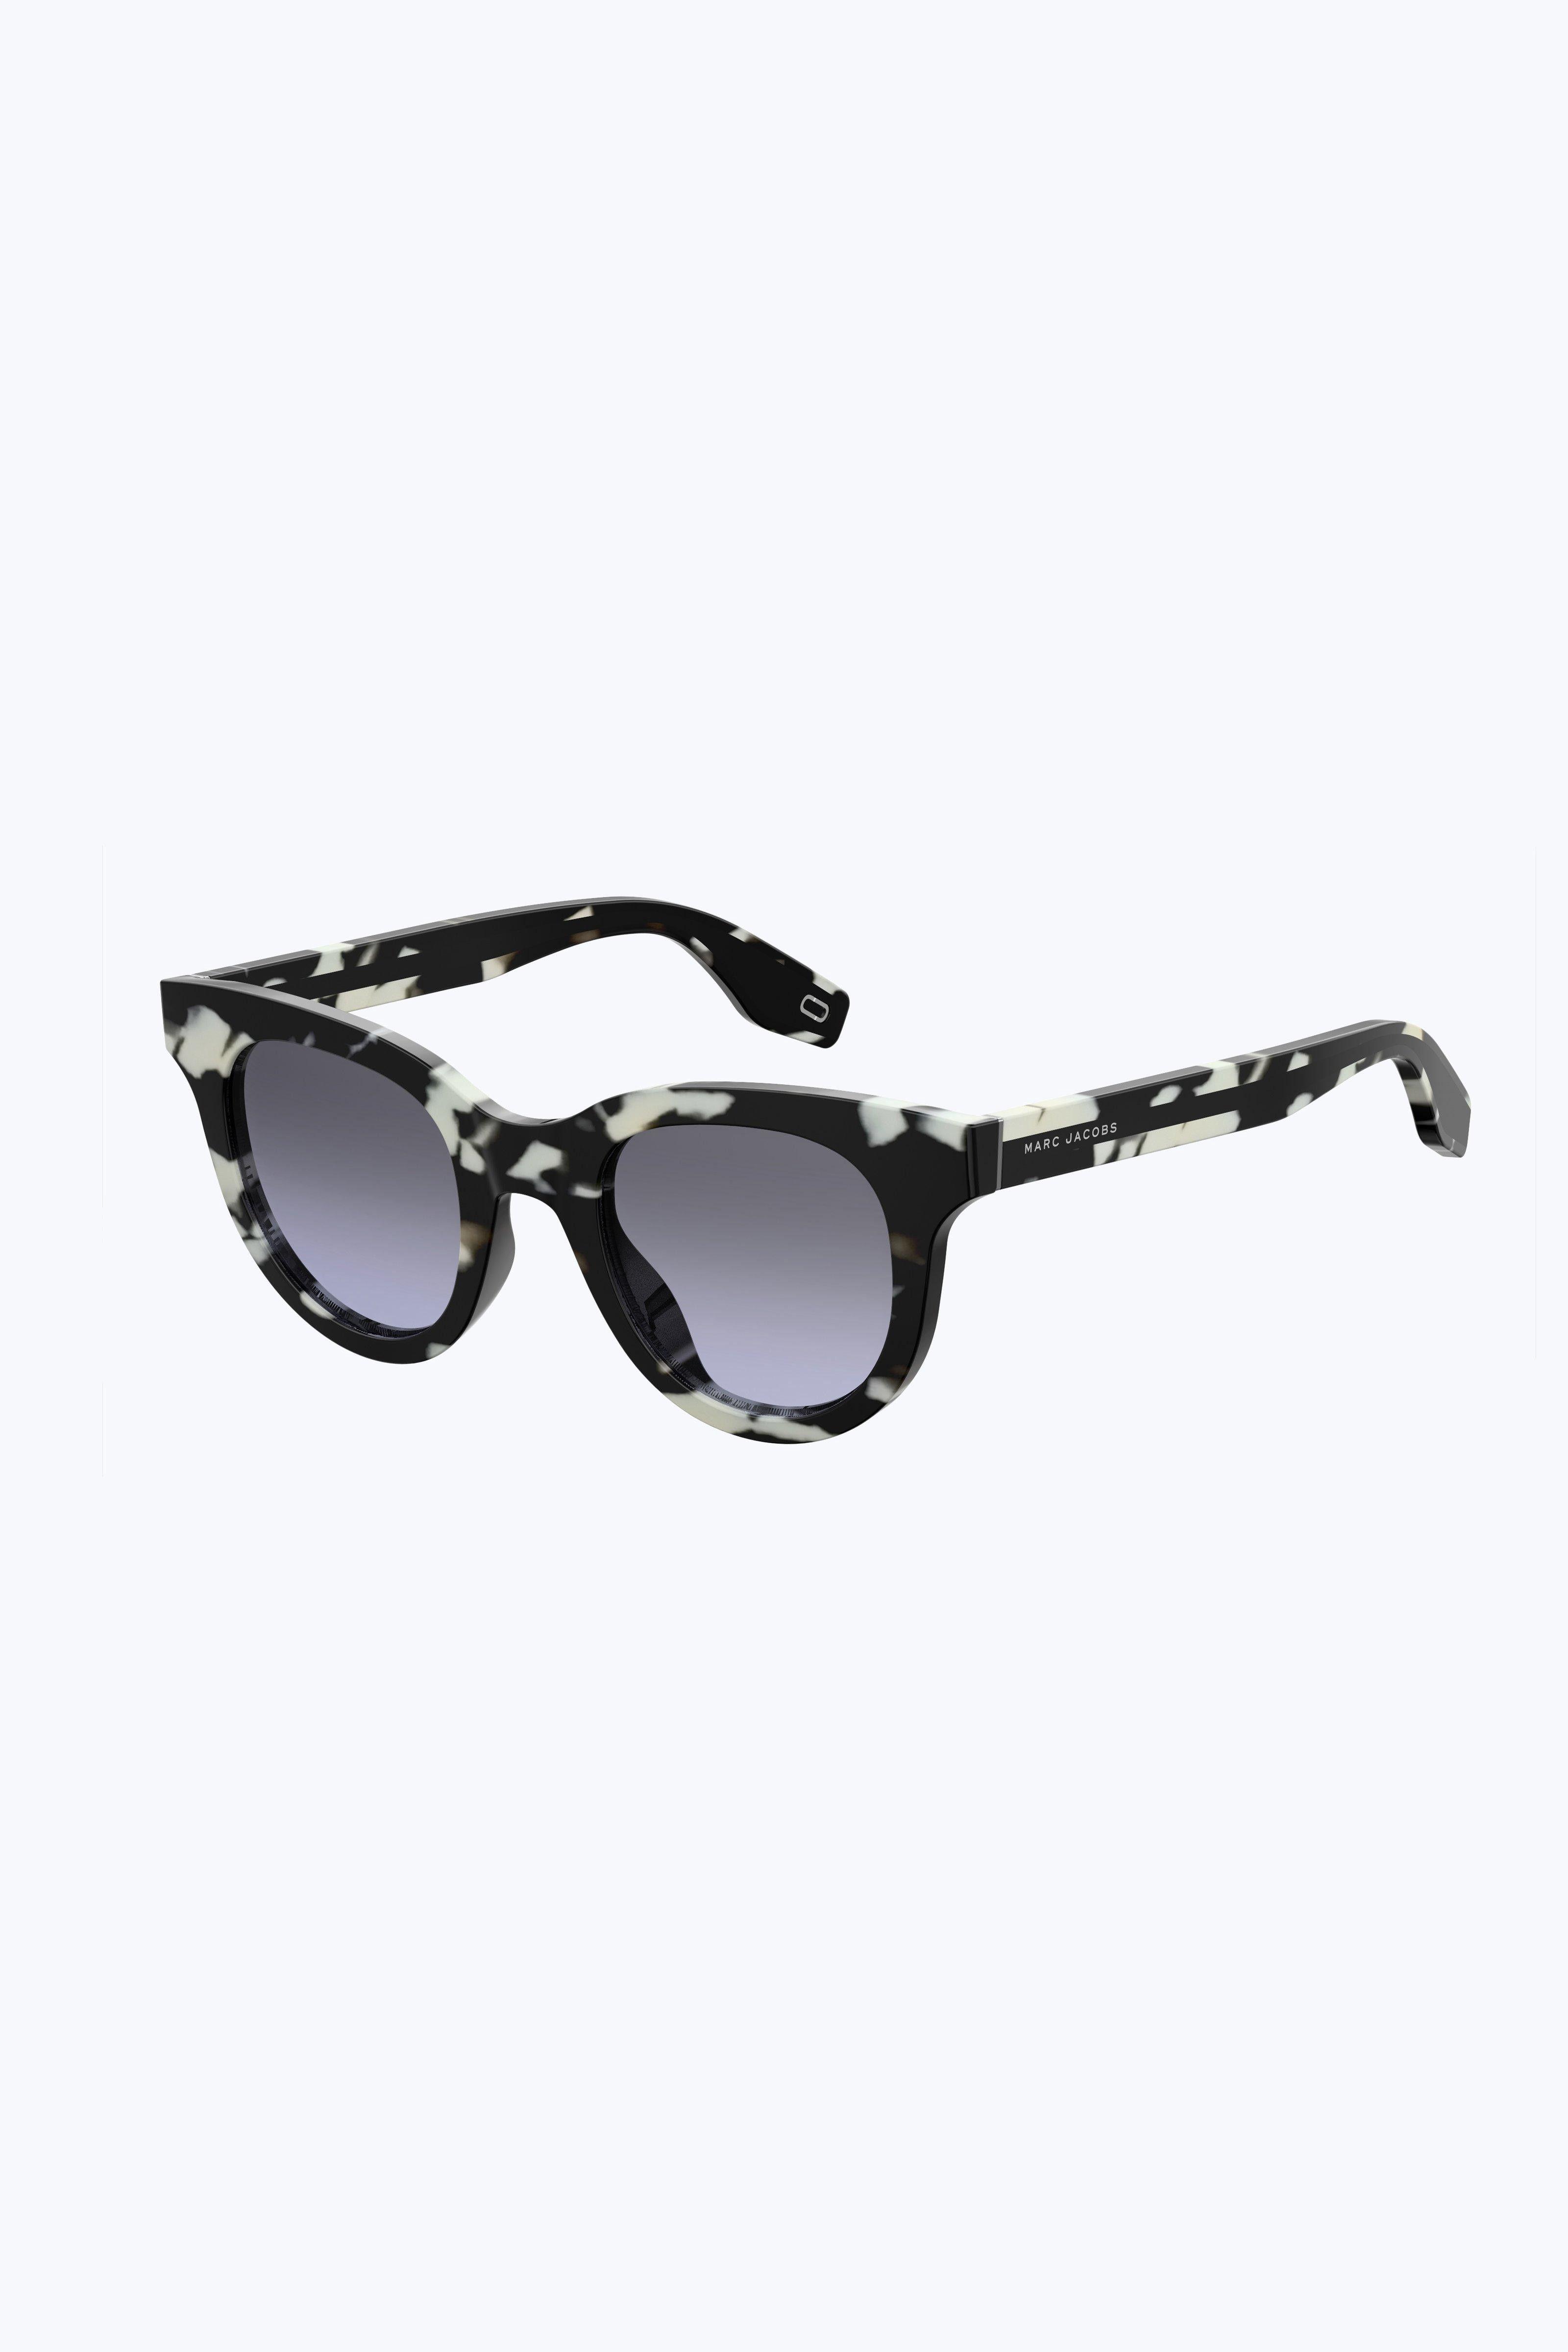 e1dc8e55e8 Marc Jacobs Iconic Stripes Round Cateye - Black Dark Grey 1Sz ...